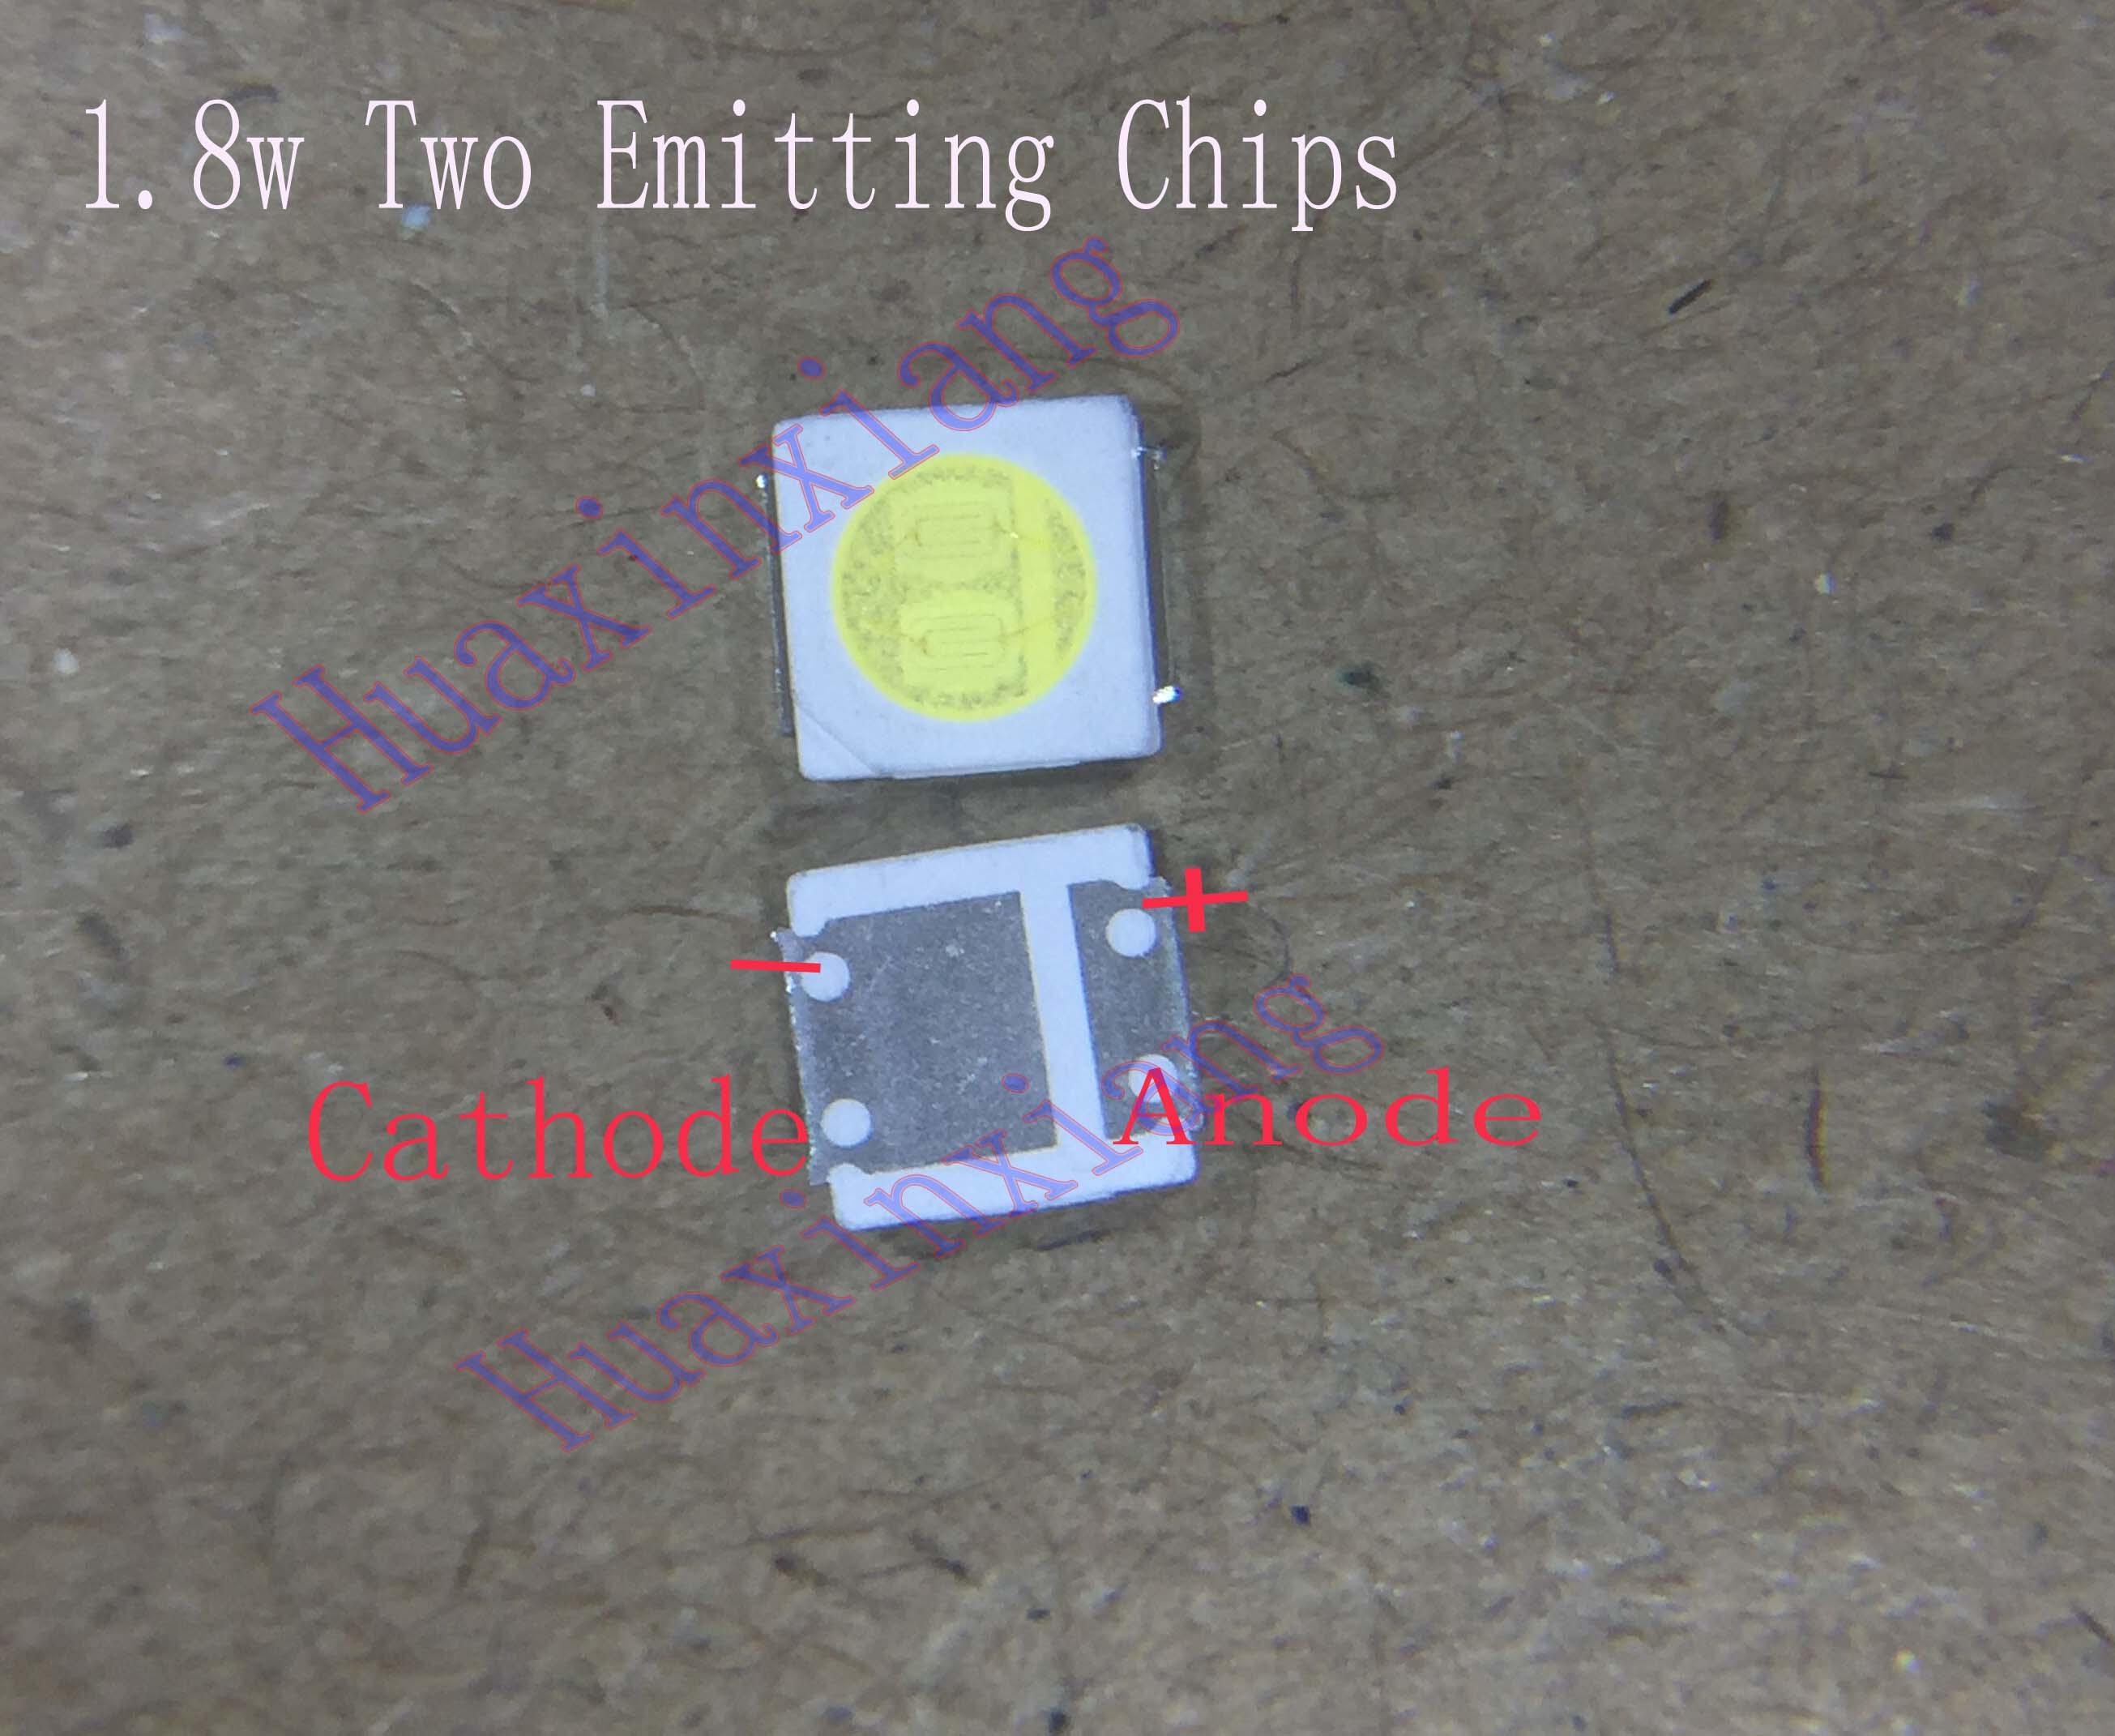 500pcs/Lot SMD LED 3030 3V 1.8W Cold white High Power For TV Backlight Application 3.0*3.0*0.6mm